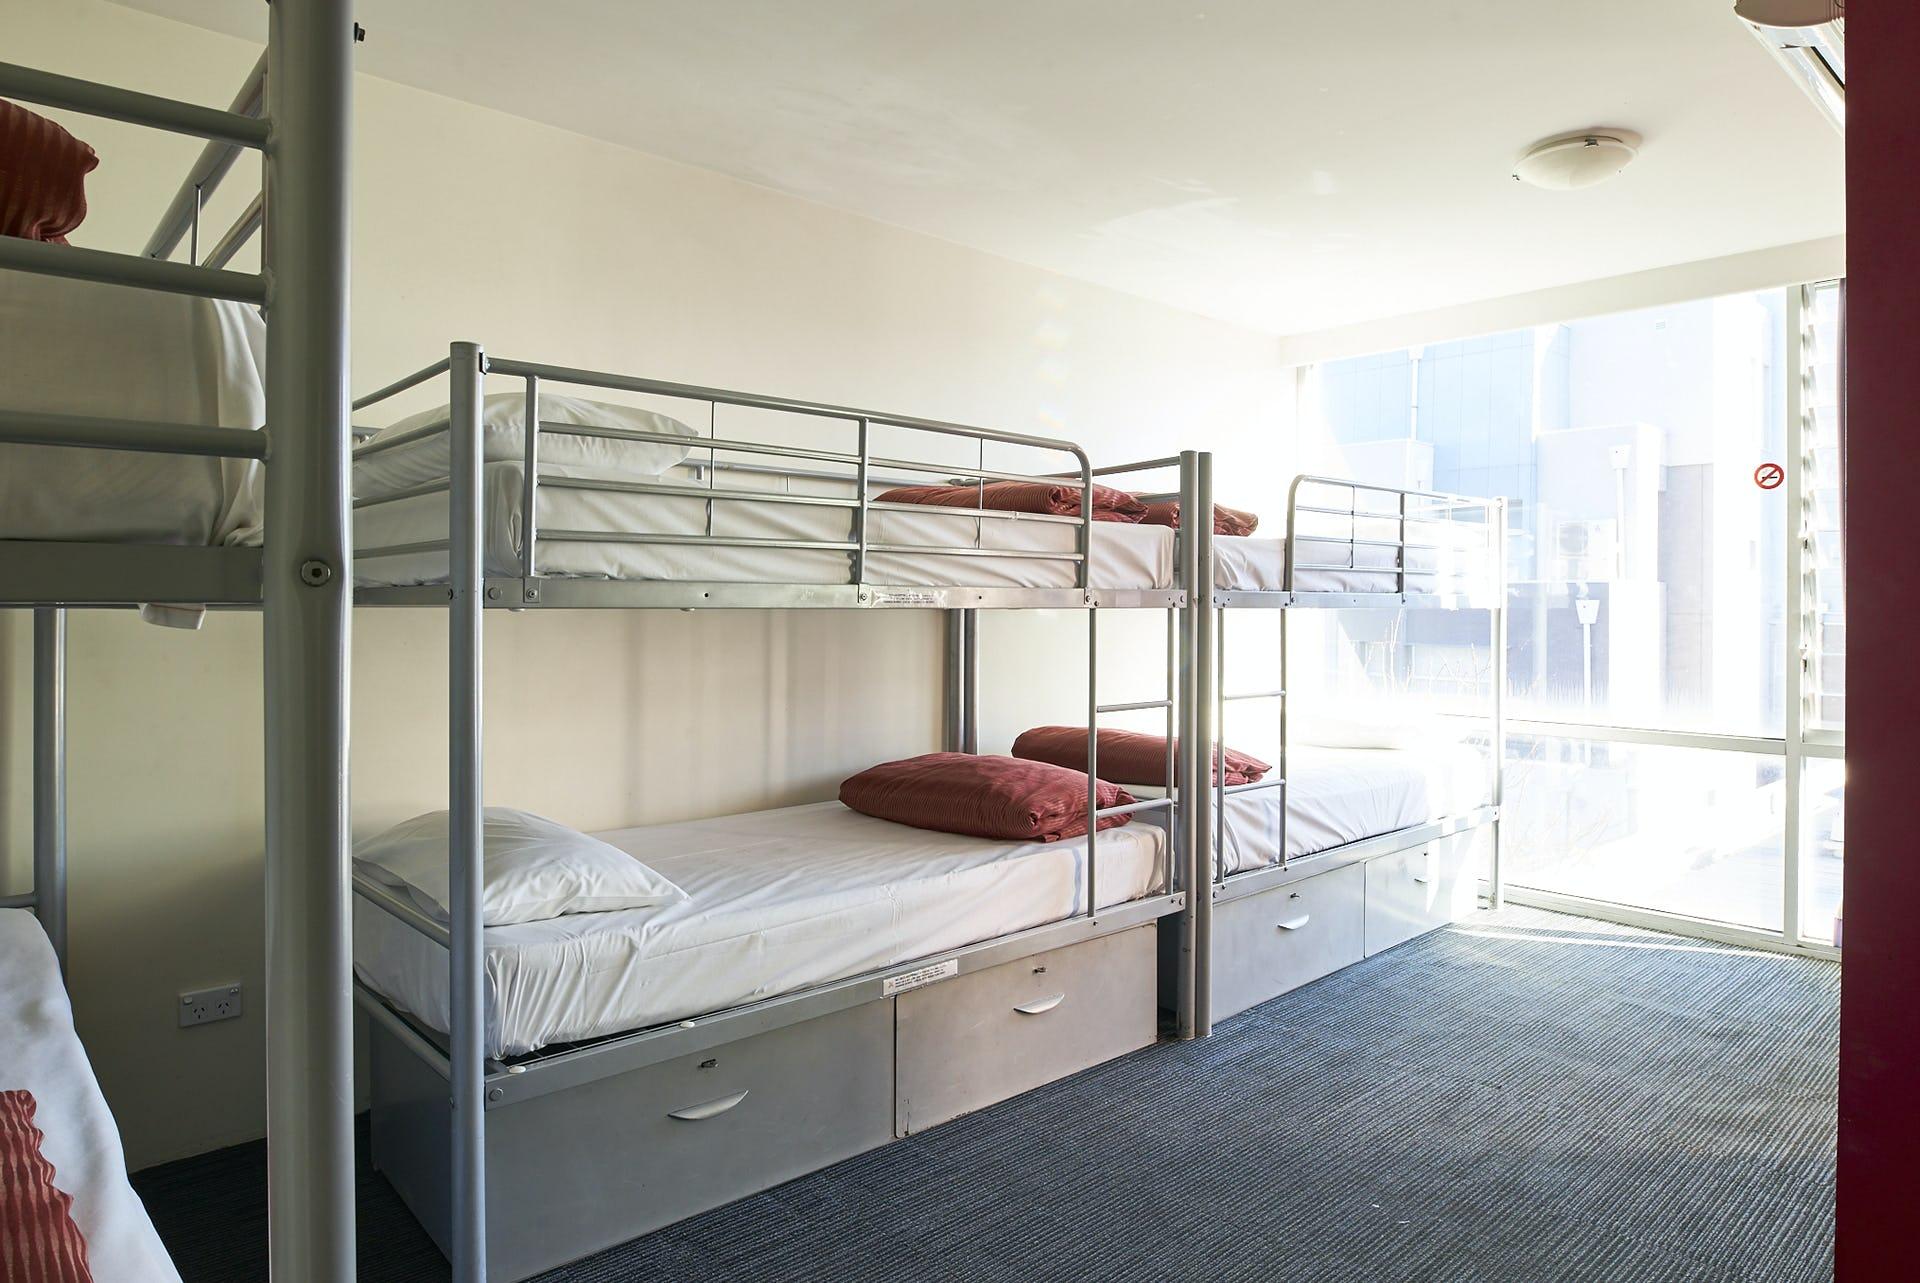 Base墨尔本背包客旅馆的6床套房